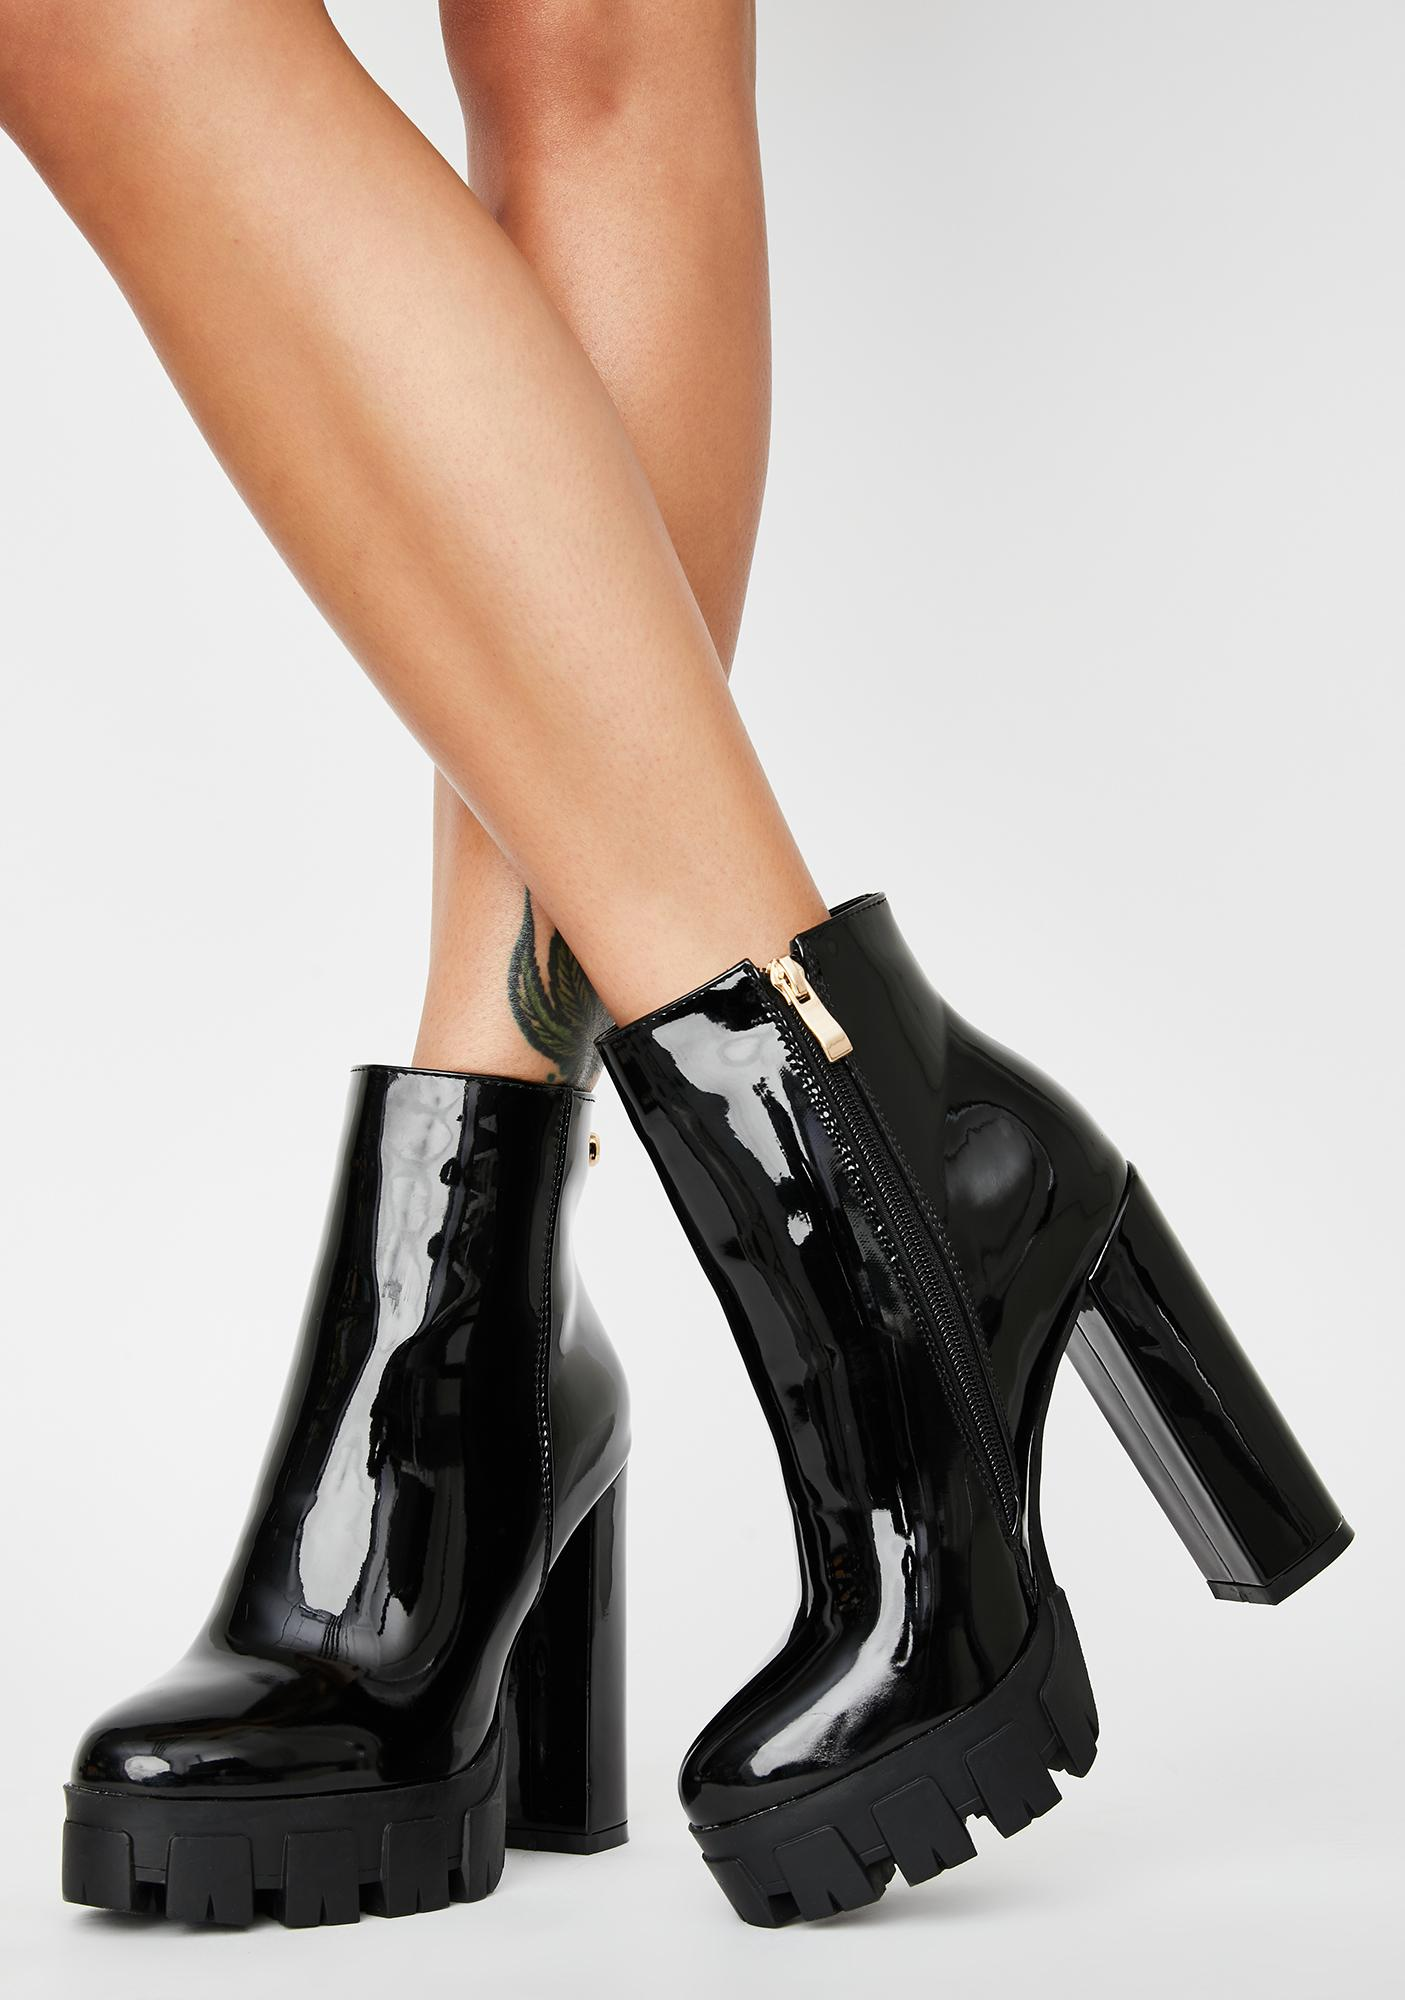 AZALEA WANG Black Patent Quake Heeled Boots